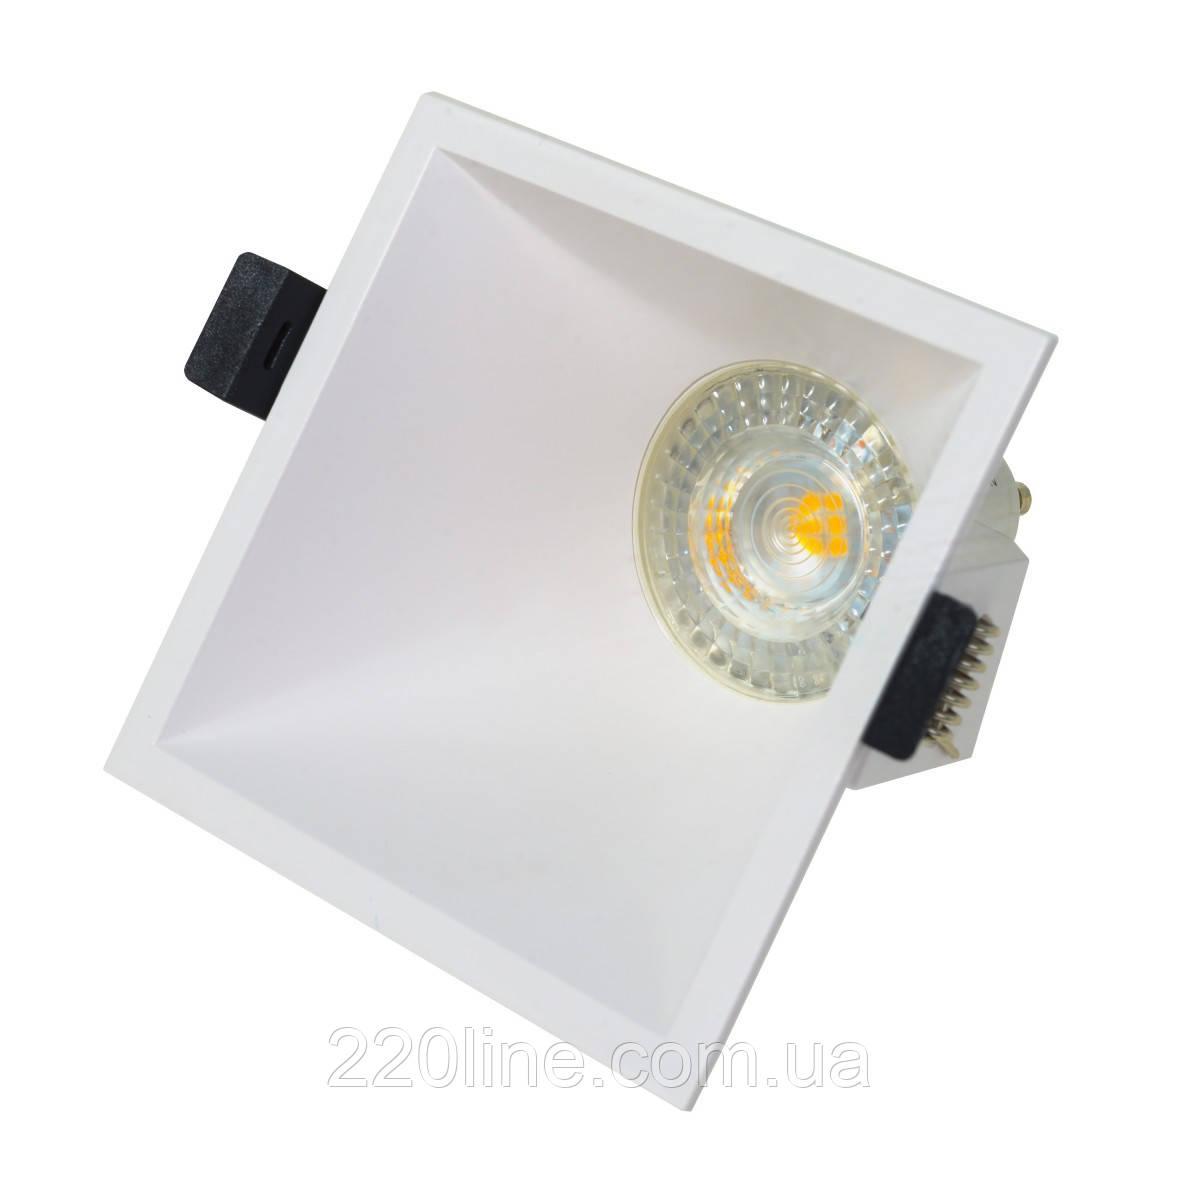 Світильник точковий HDL-DS 177A GU5.3 WH